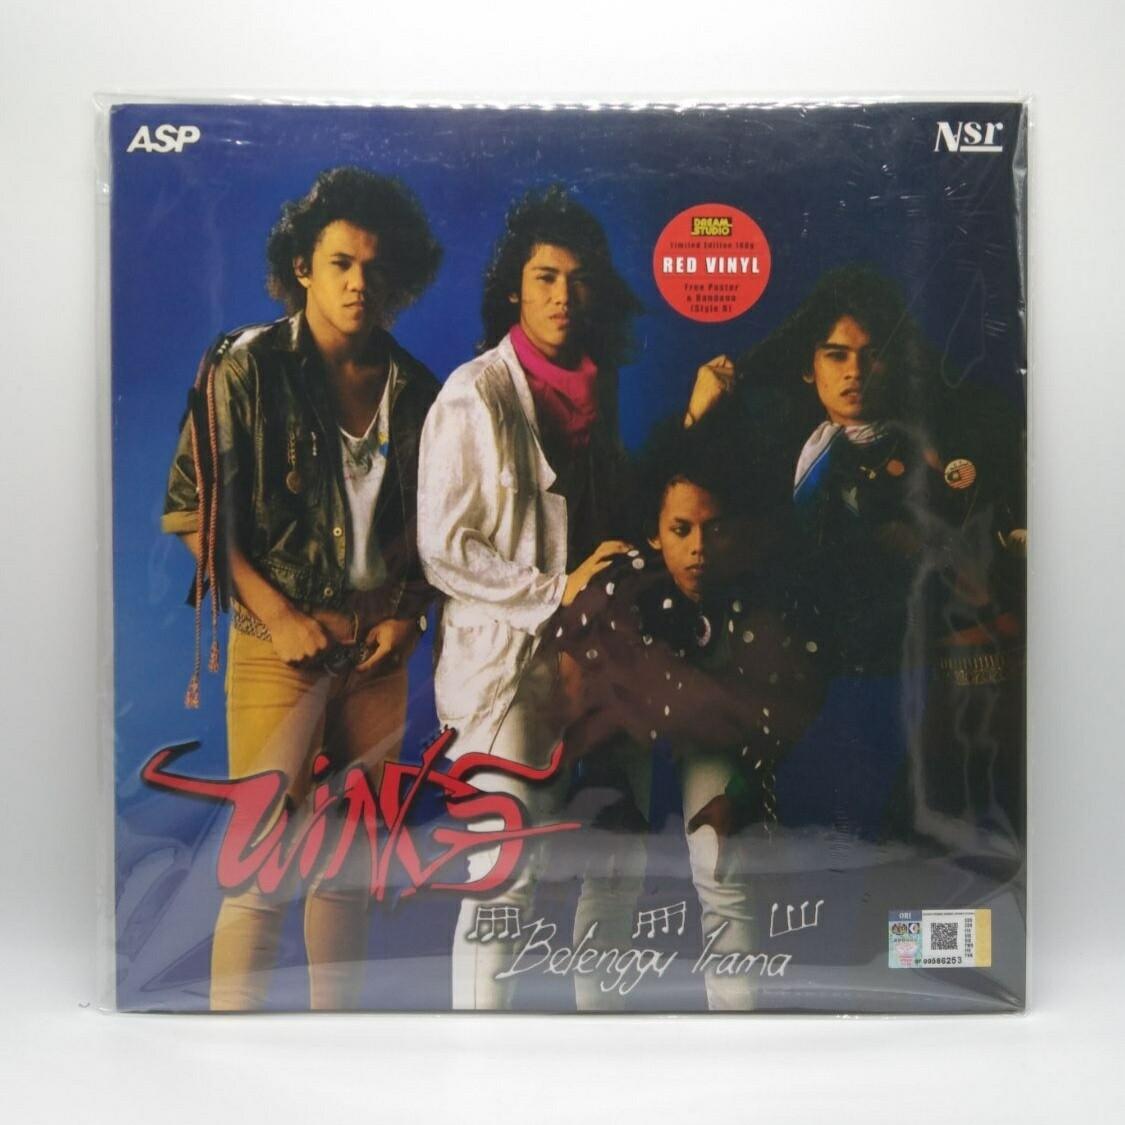 WINGS -BELENGGU IRAMA- LP (RED VINYL)